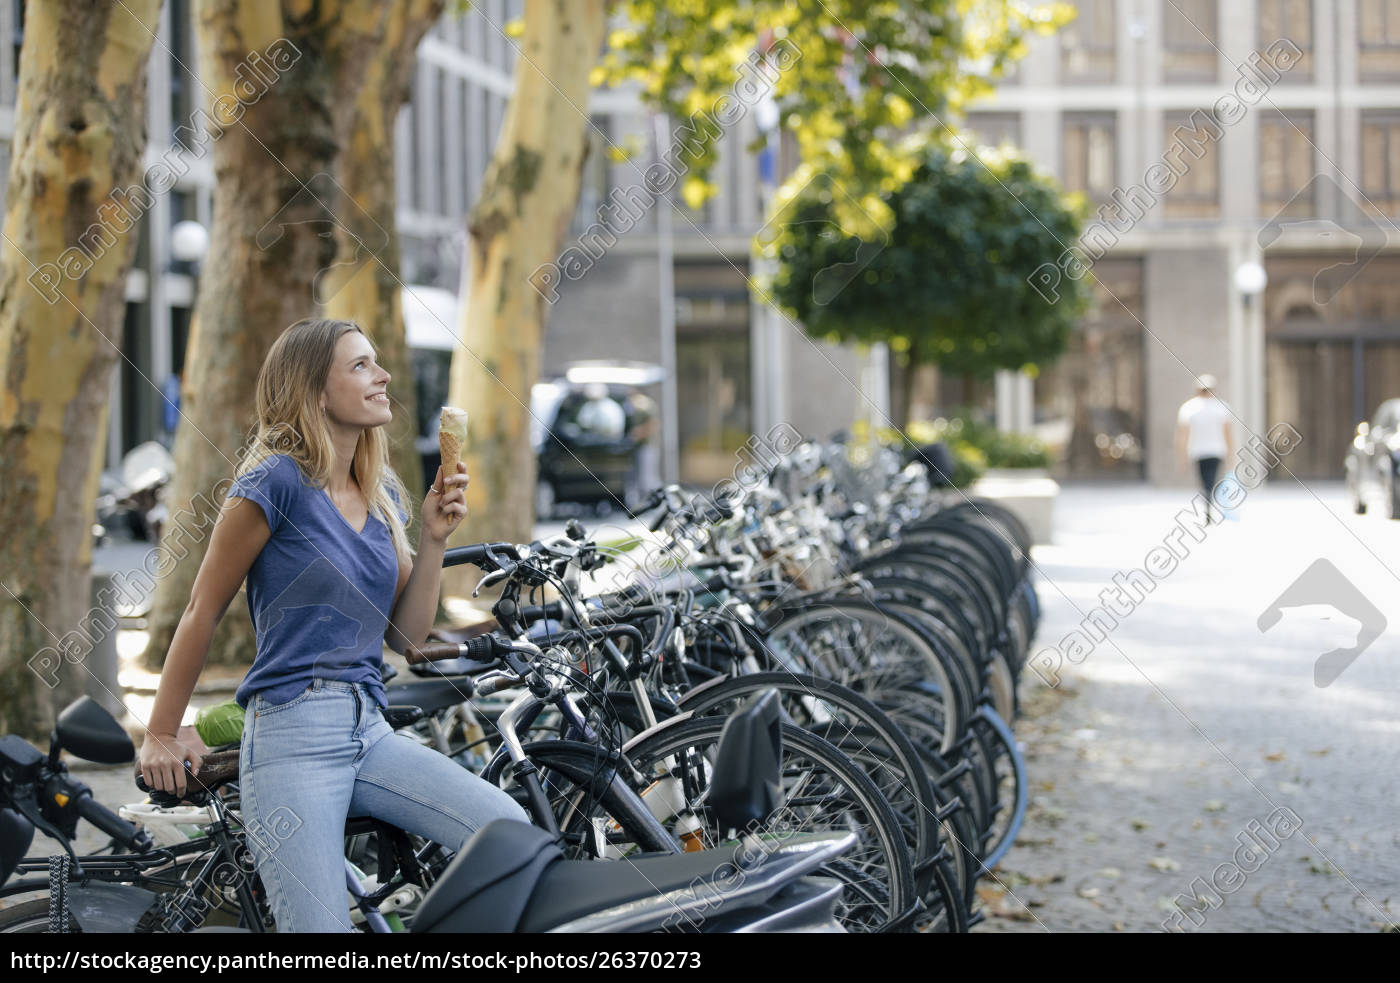 niederlande, maastricht, lächelnde, blonde, junge, frau, hält, eiskegel - 26370273